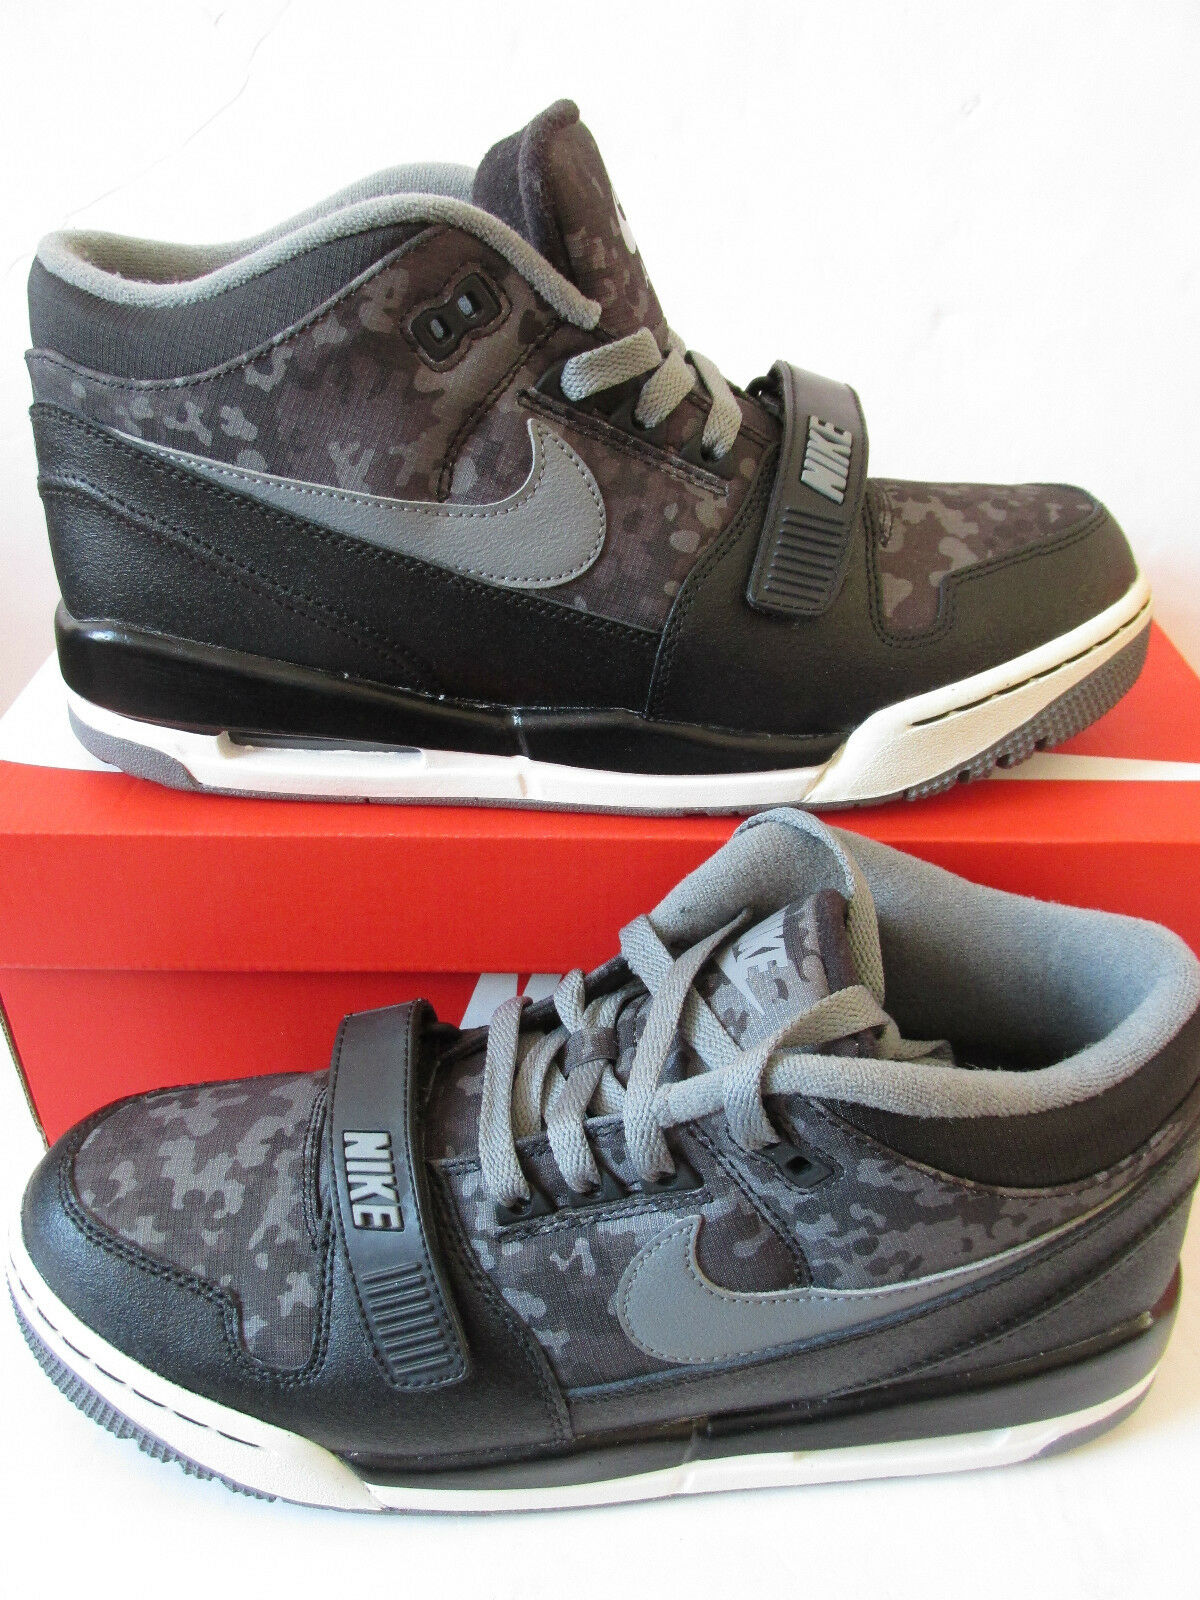 Nike Air Alphalution Prm da Uomo Hi da Ginnastica 708478 001 Scarpe da Tennis Scarpe classiche da uomo